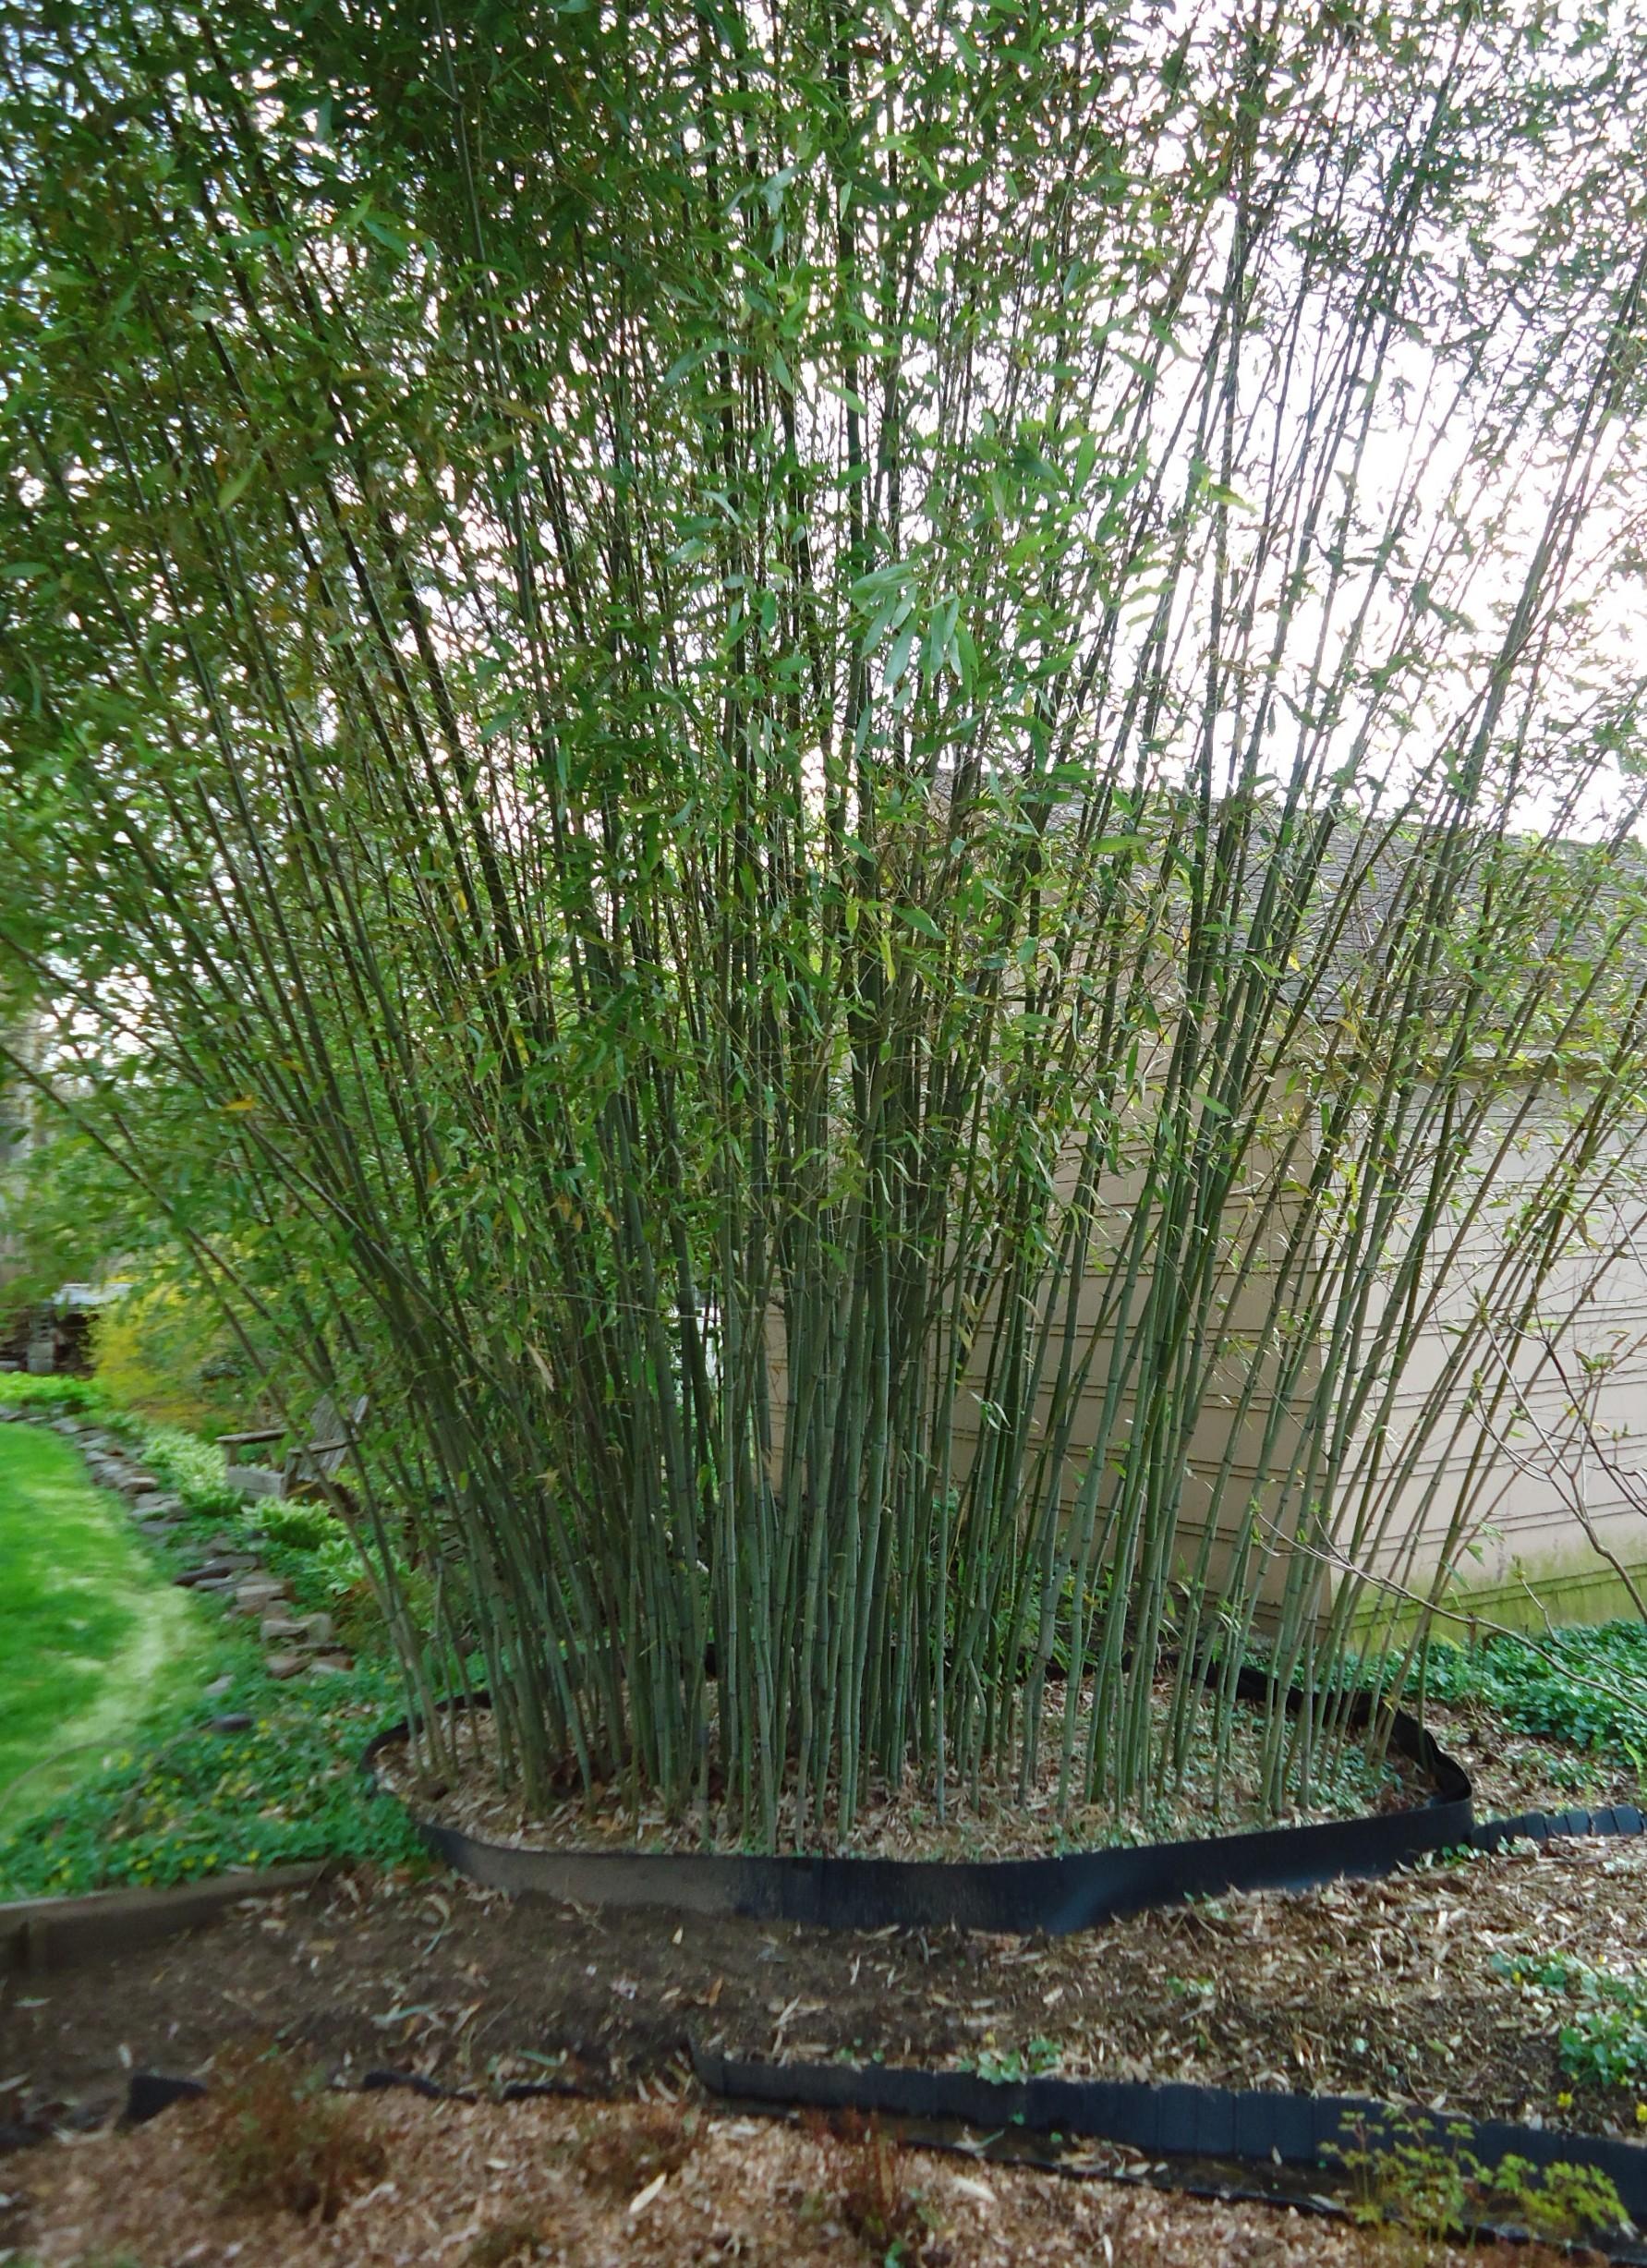 Nj Bamboo Landscaping: File:Bamboo Growing In Backyard Of New Jersey Gardener